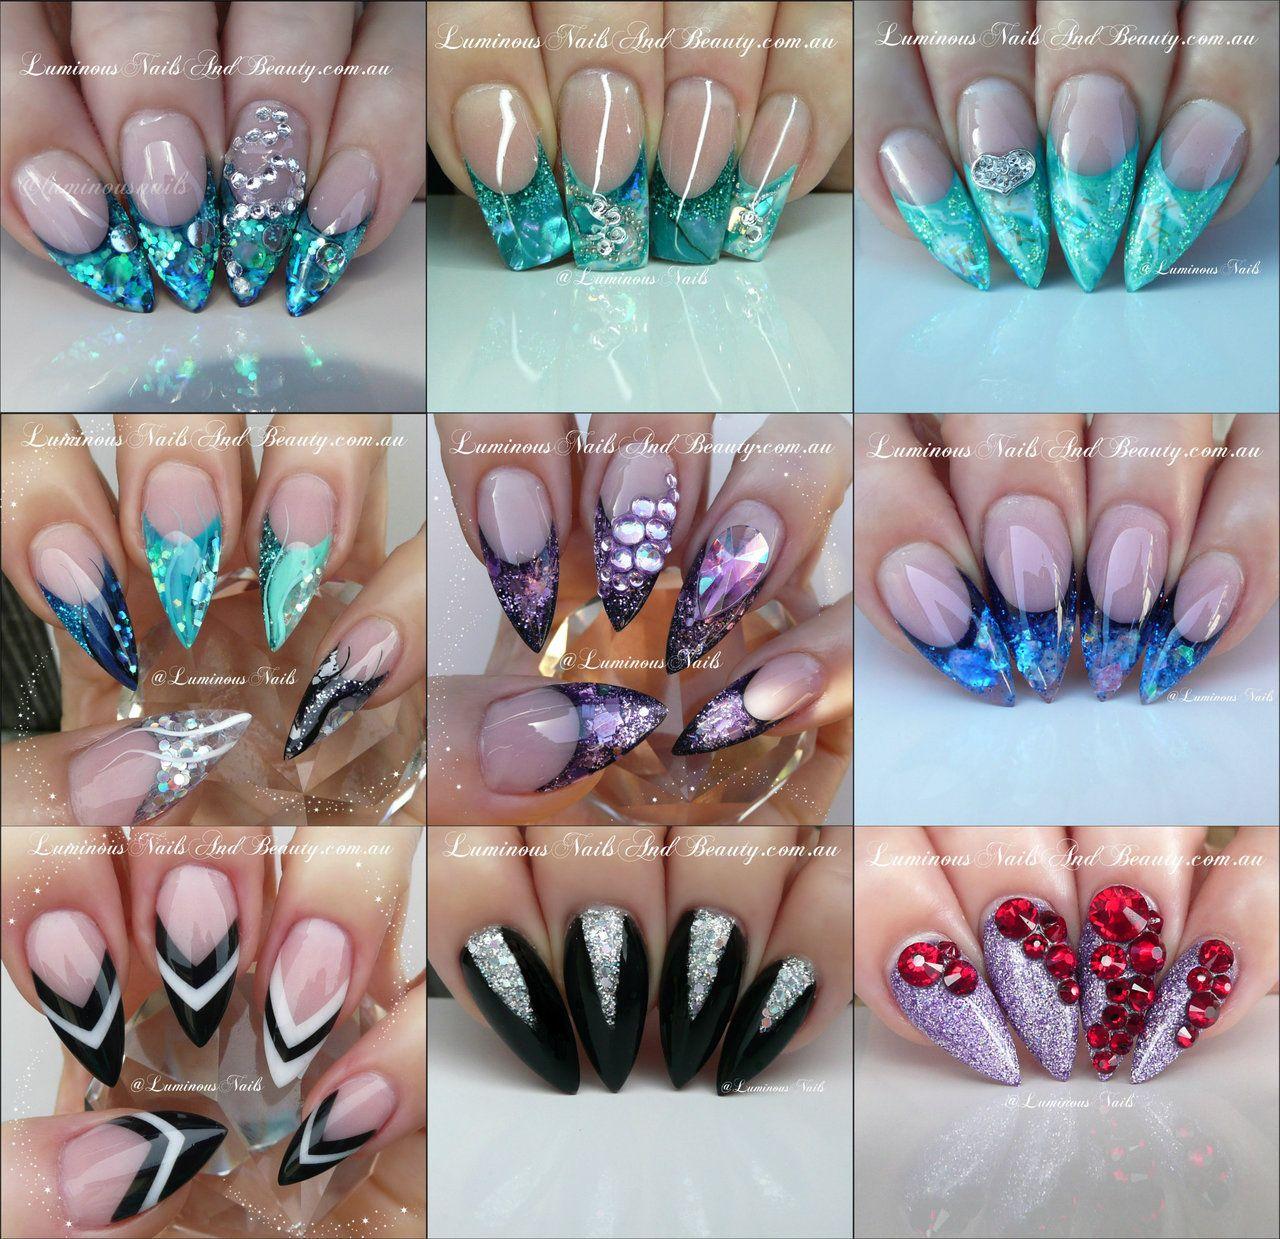 How to Create 10 Wow Factor Nail Art Designs | Luminous nails ...